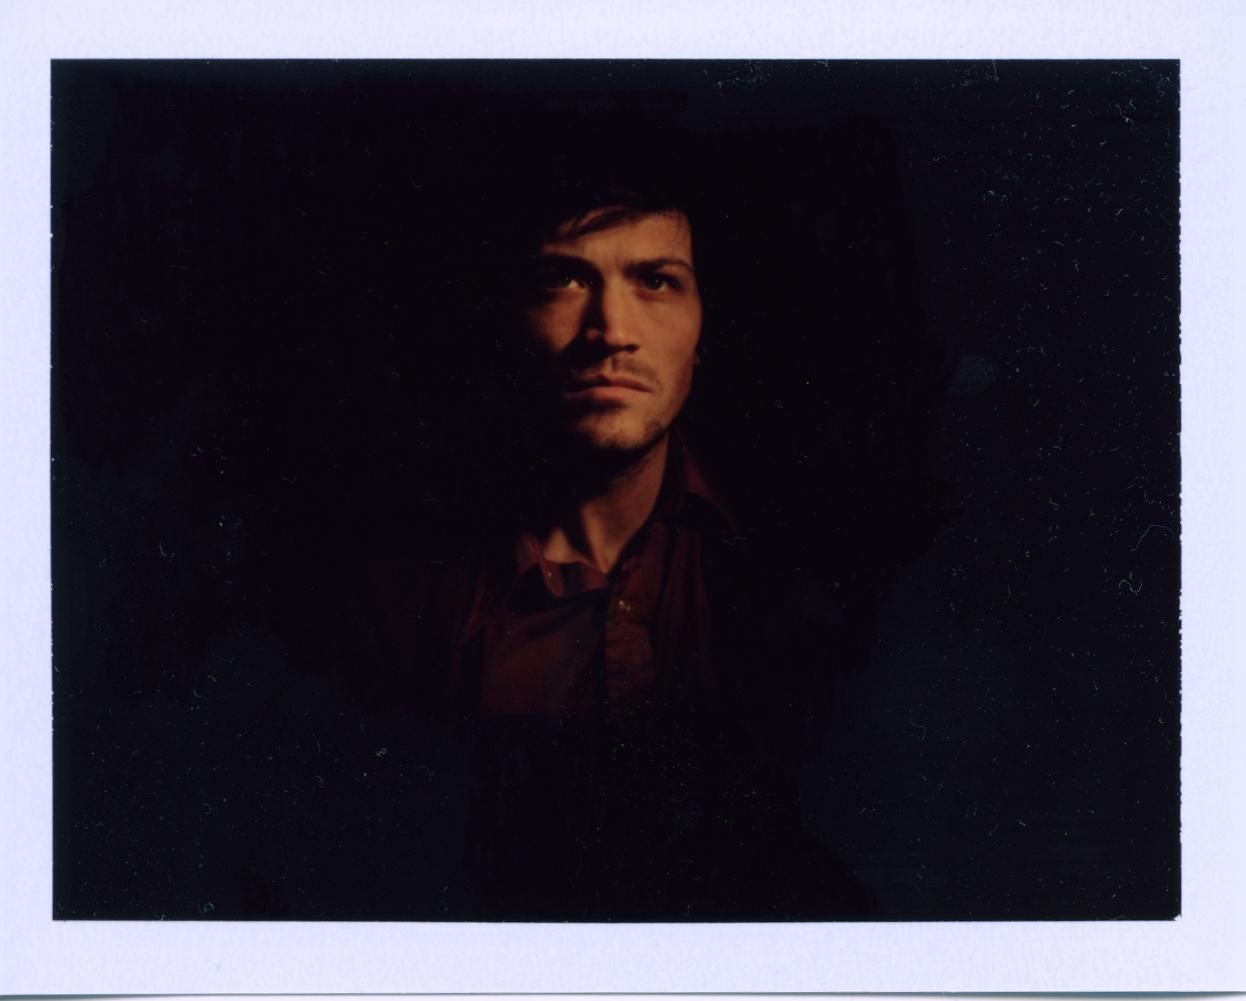 miller-portrait-polaroid-editorial-23